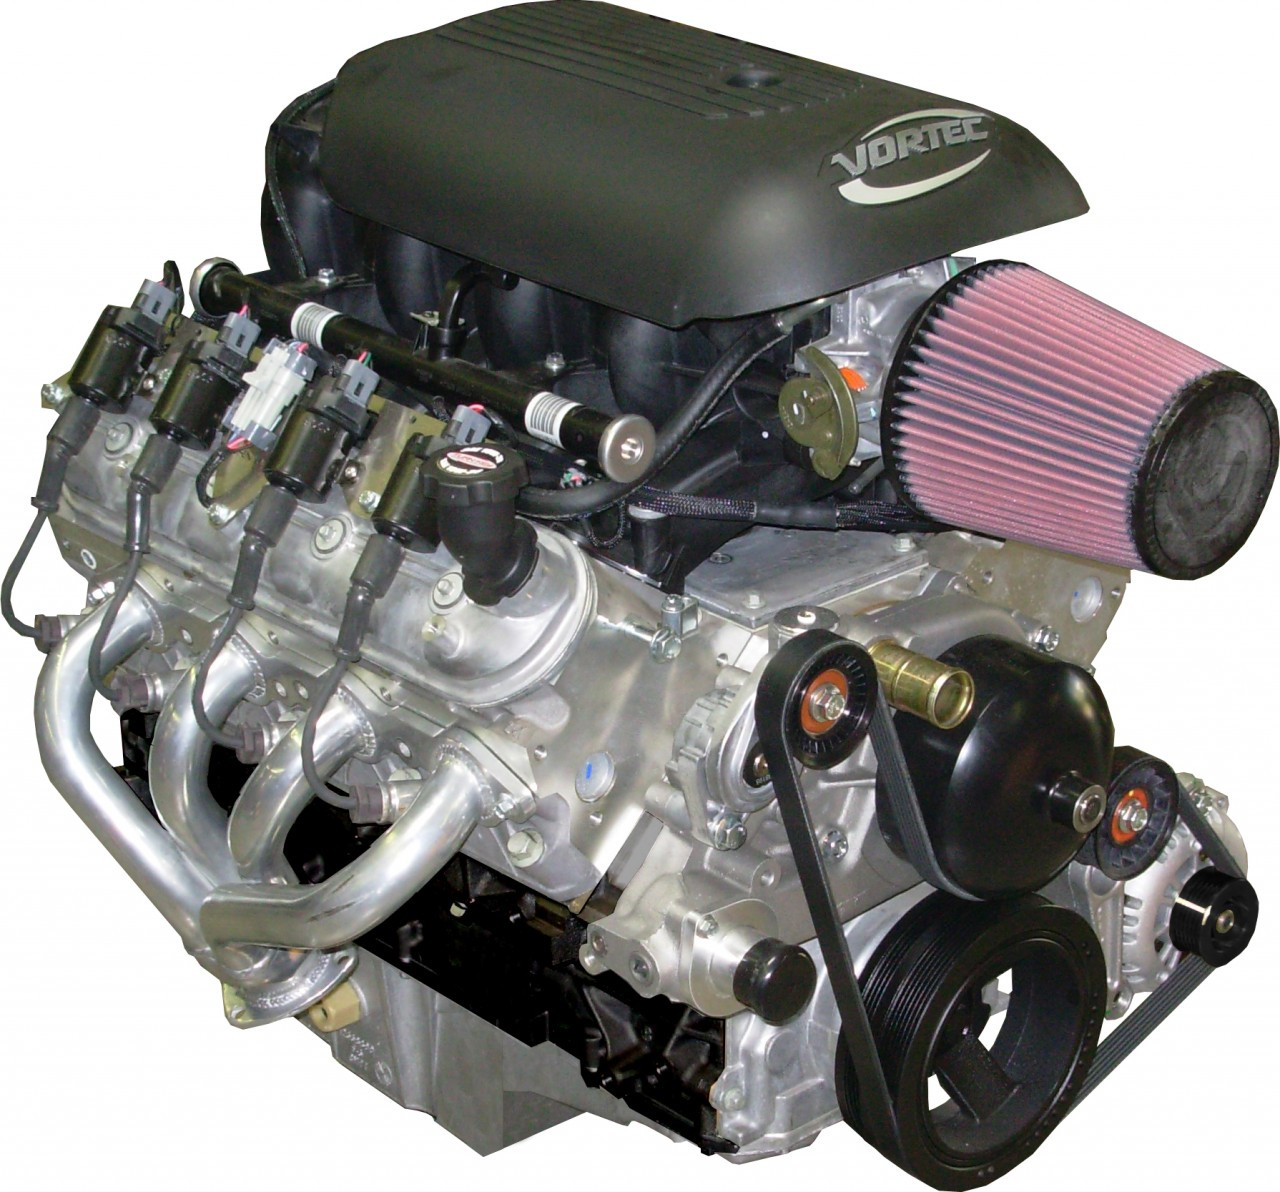 Turn Key Engine 885301 LS327 53L 350 HP Turn Key Engine